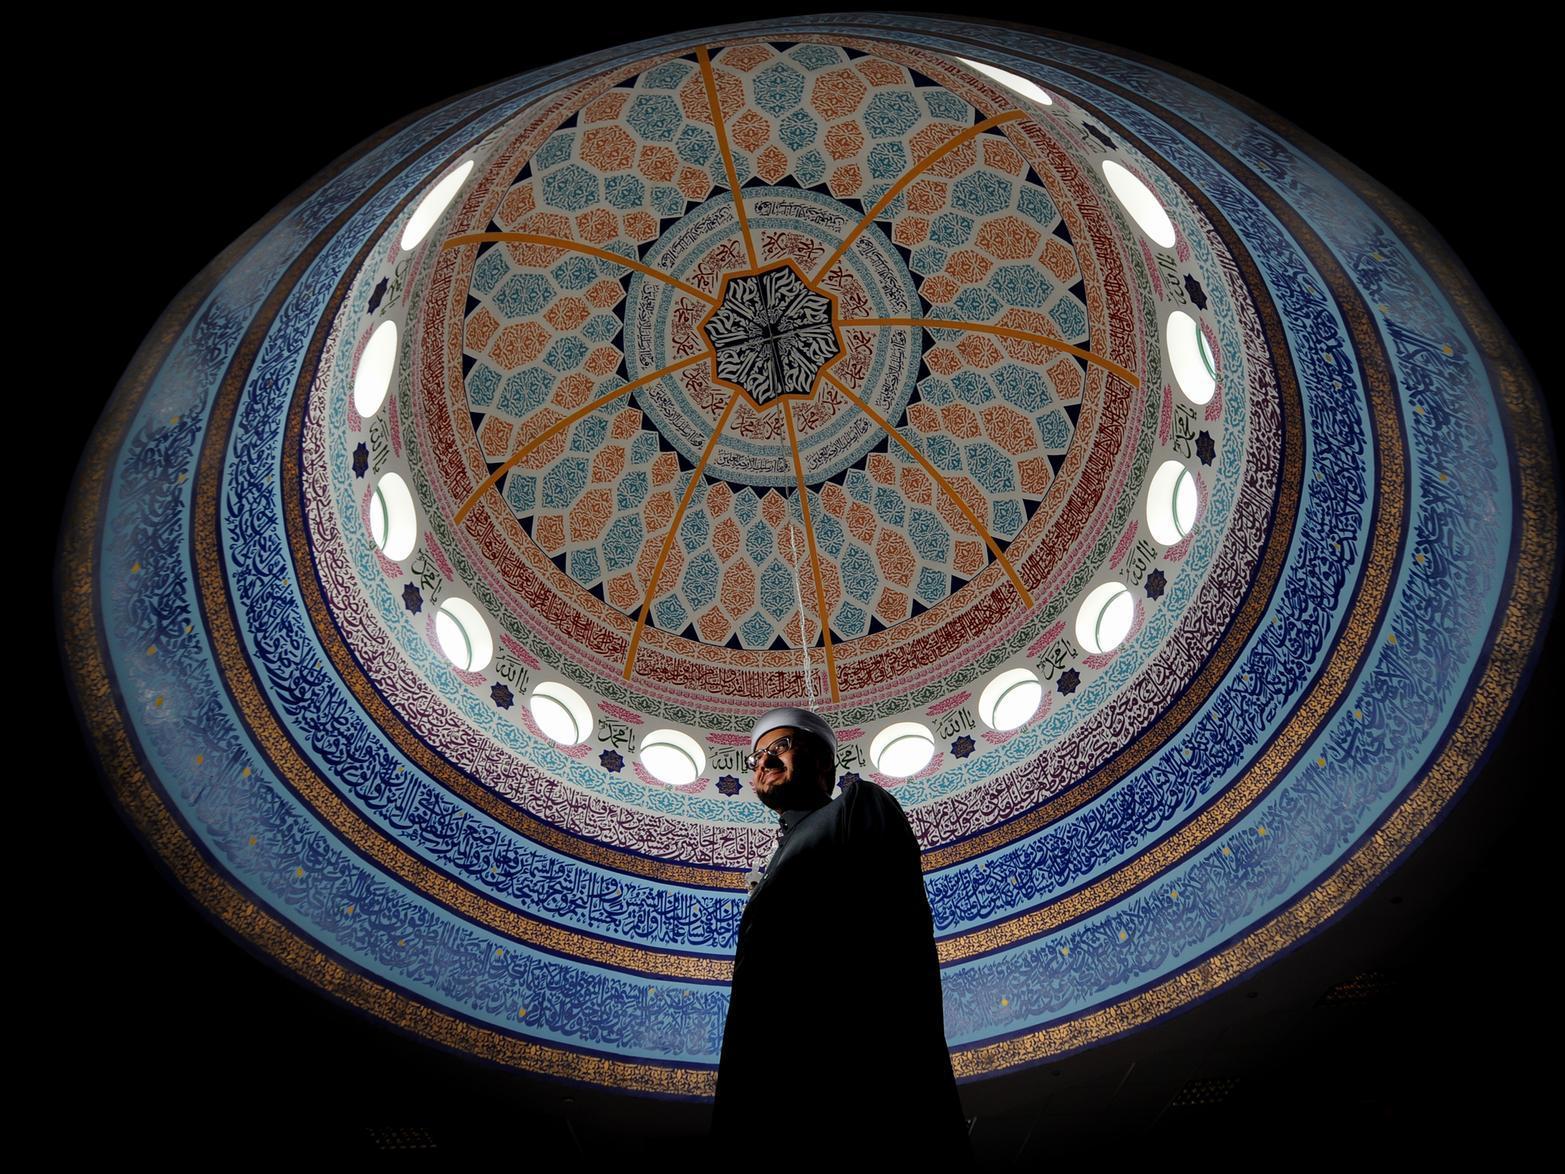 'Extremists brainwash just like paedophiles do' warns Leeds Imam